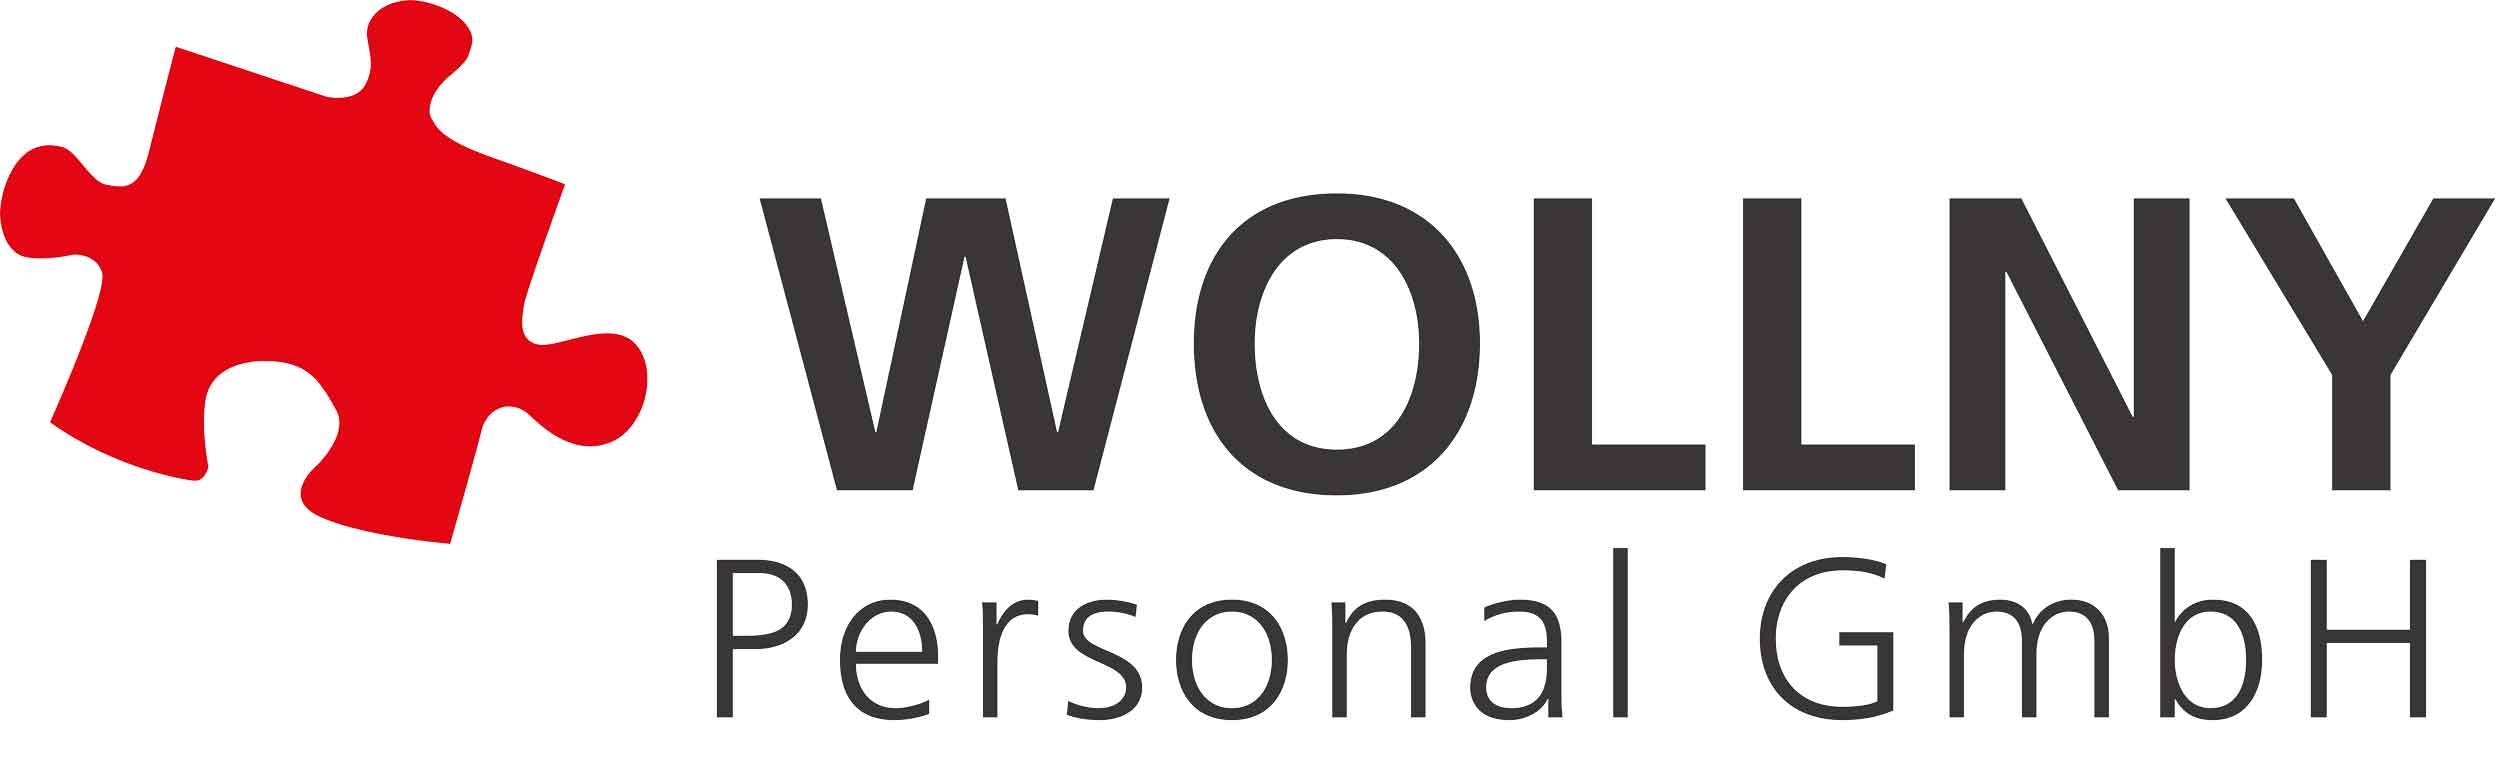 Wollny Personal GmbH Logo gross